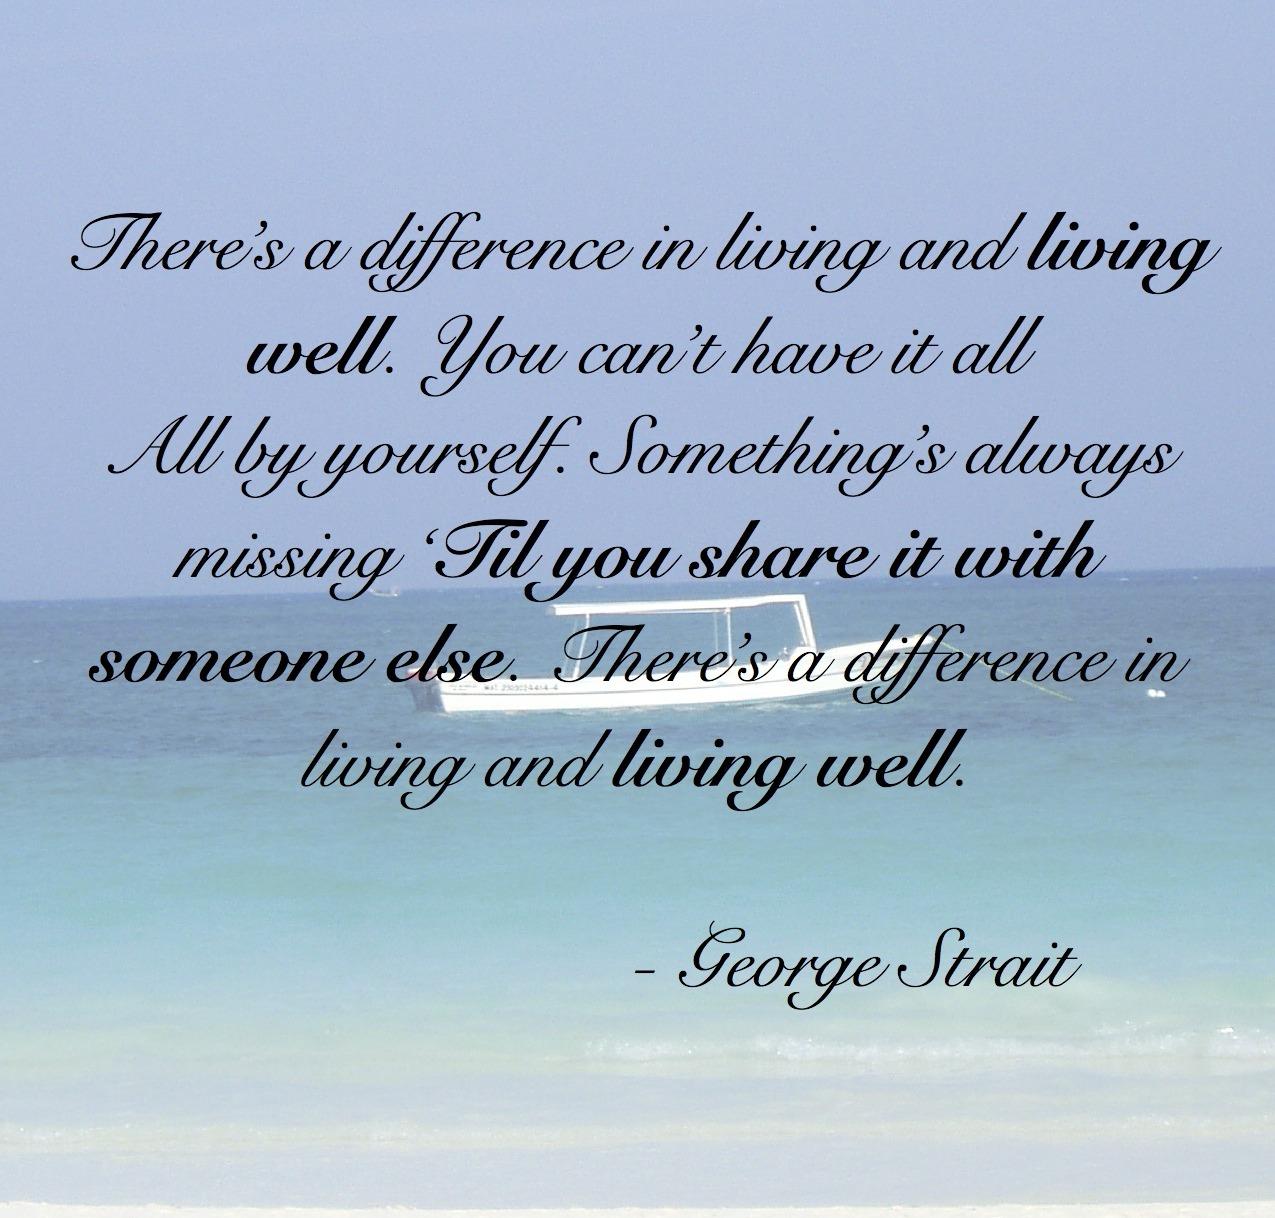 George Strait's quote #1